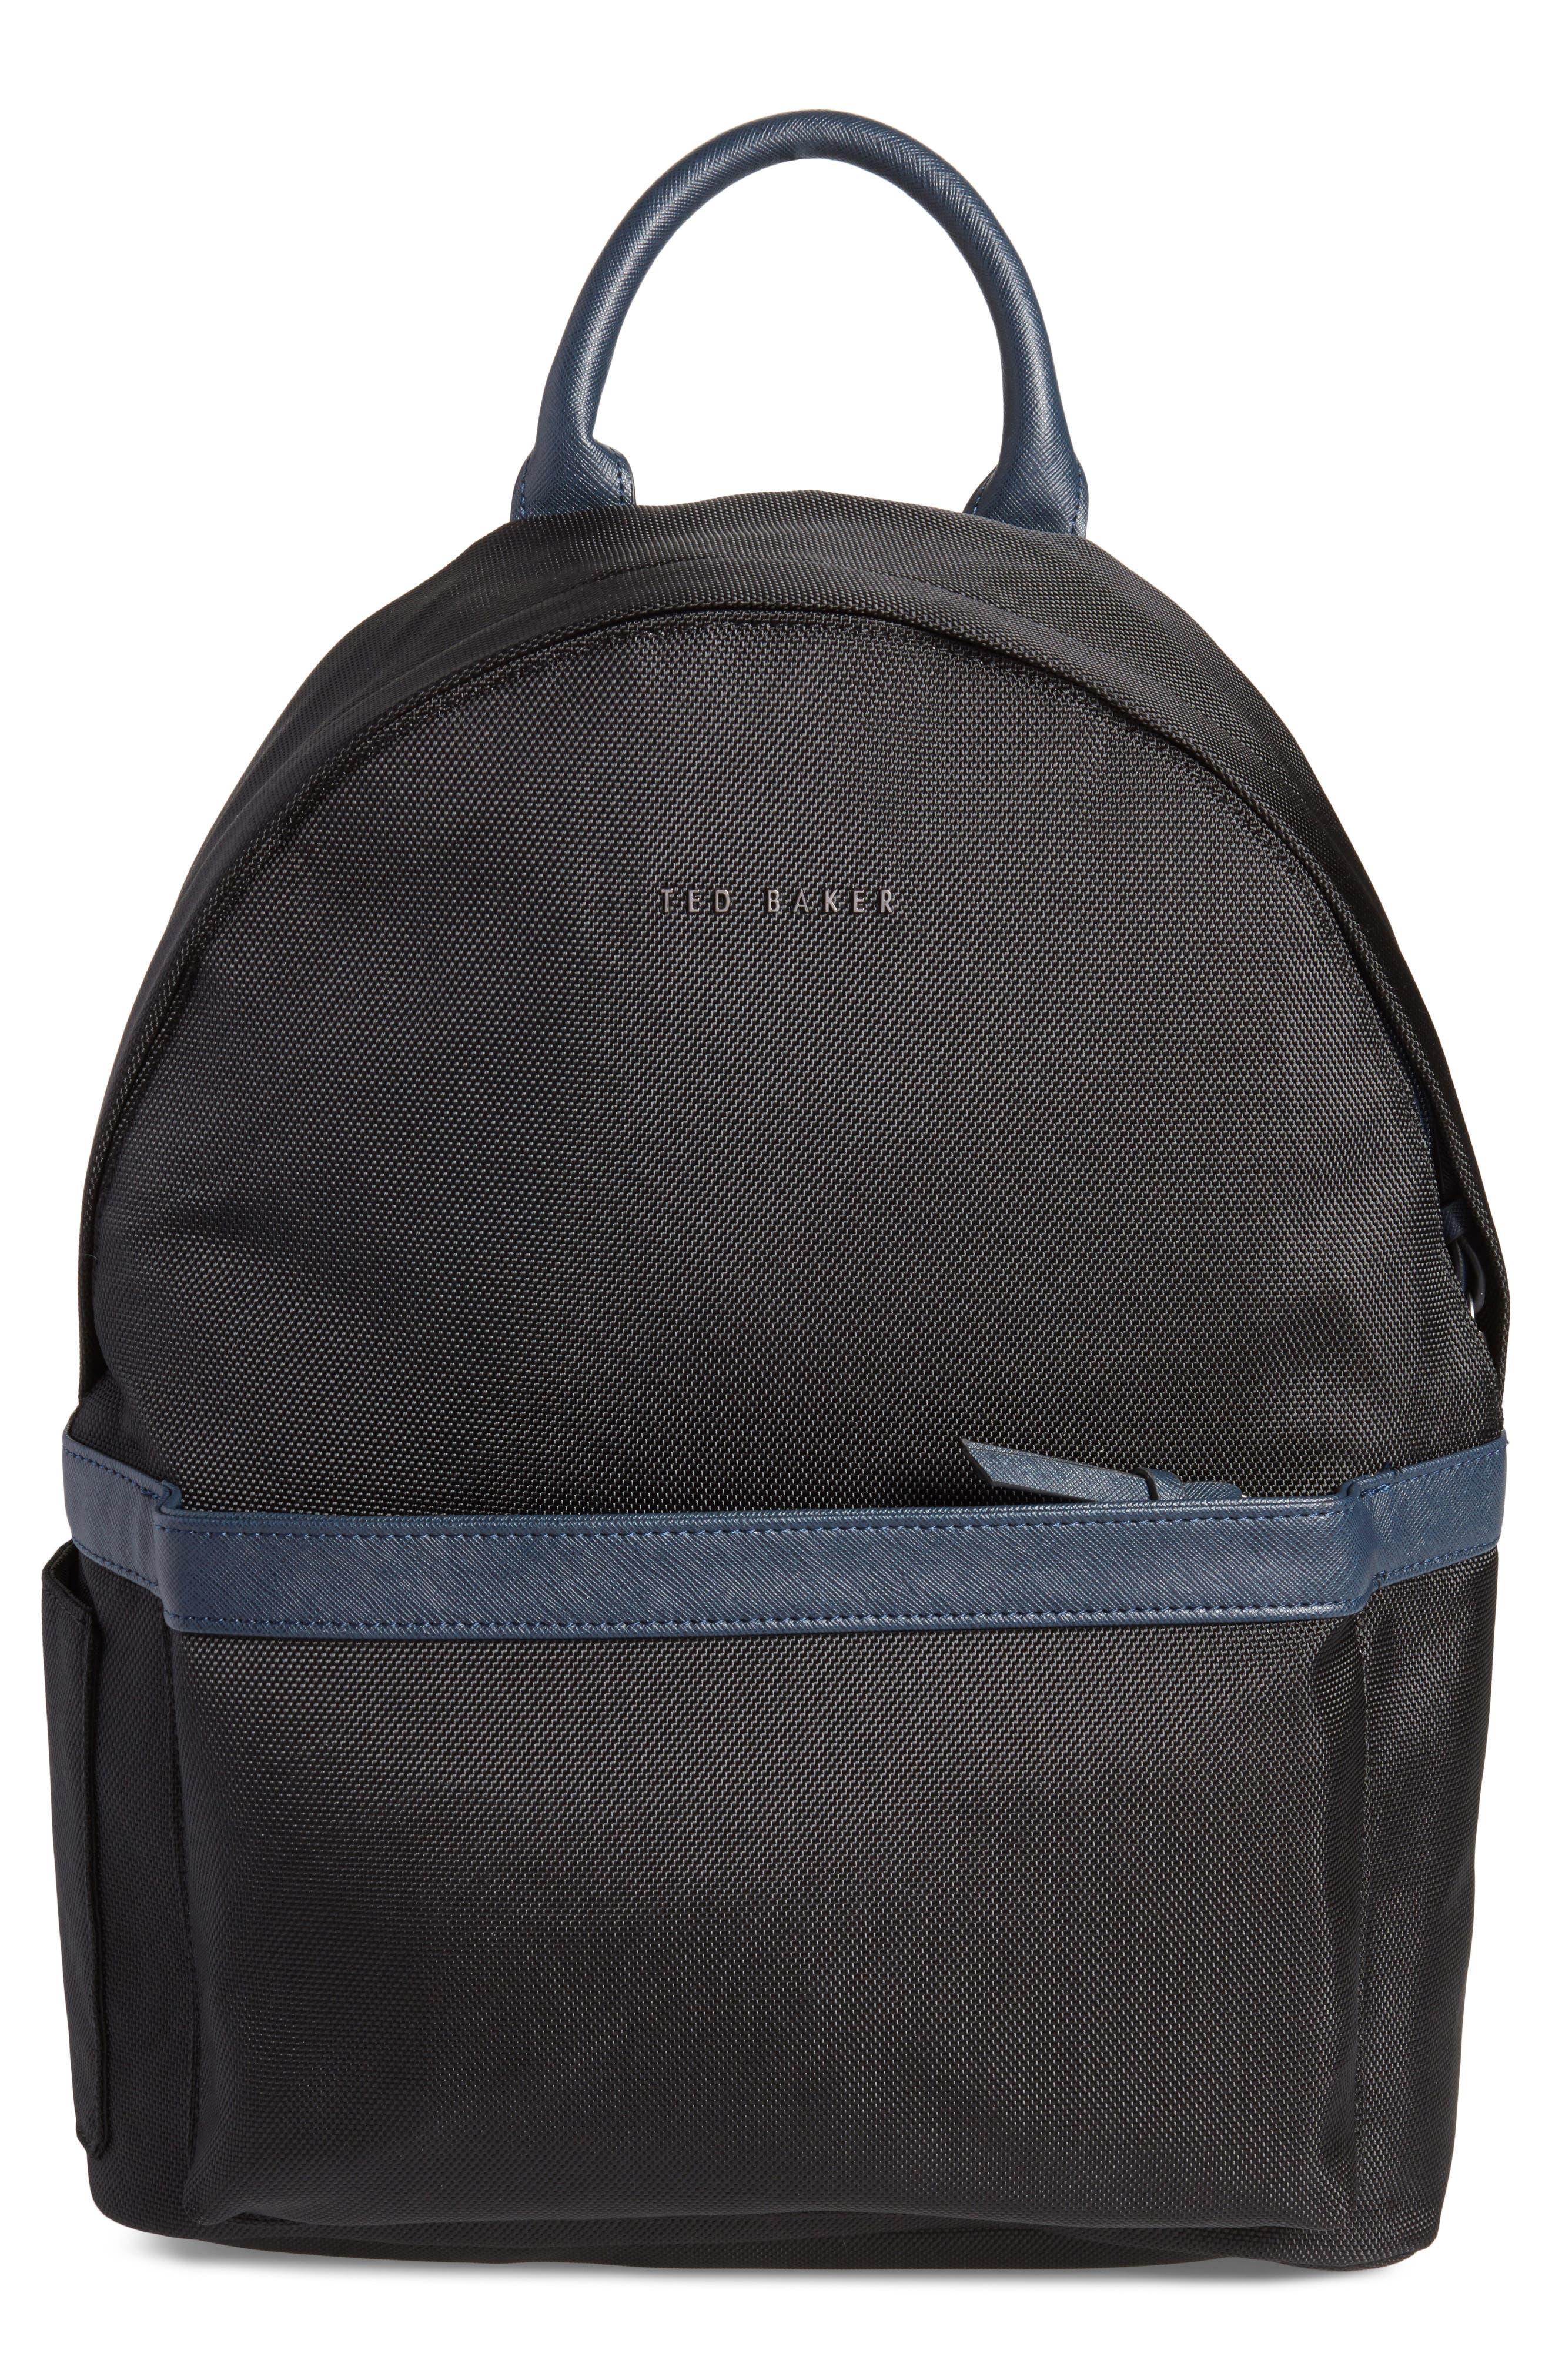 Radio Backpack,                         Main,                         color, 001